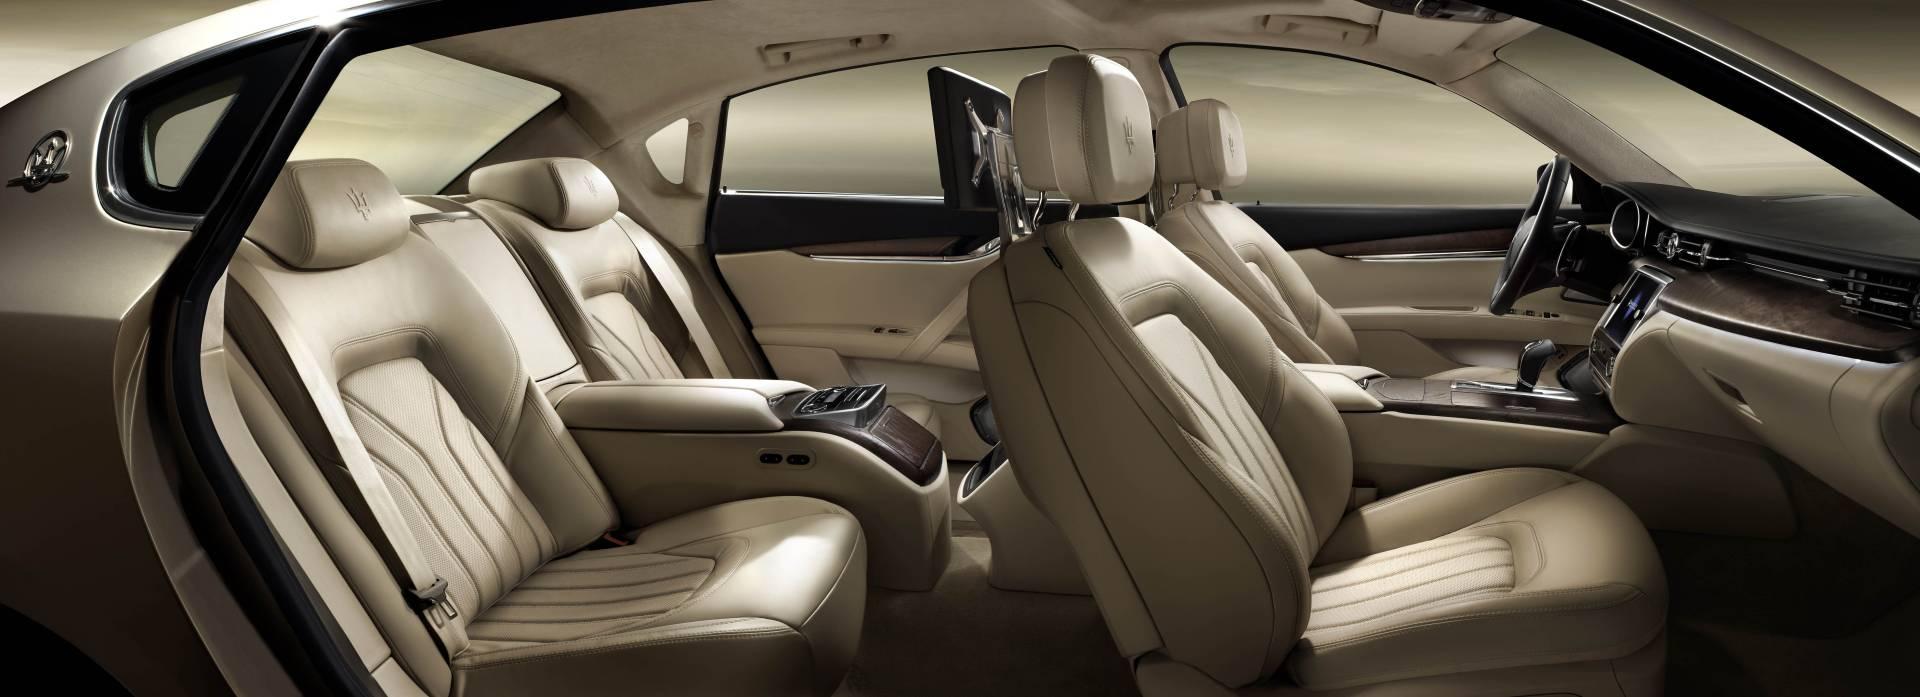 https://www.conceptcarz.com/images/Maserati/2013-Maserati-Quattroporte-Sedan-i02.jpg